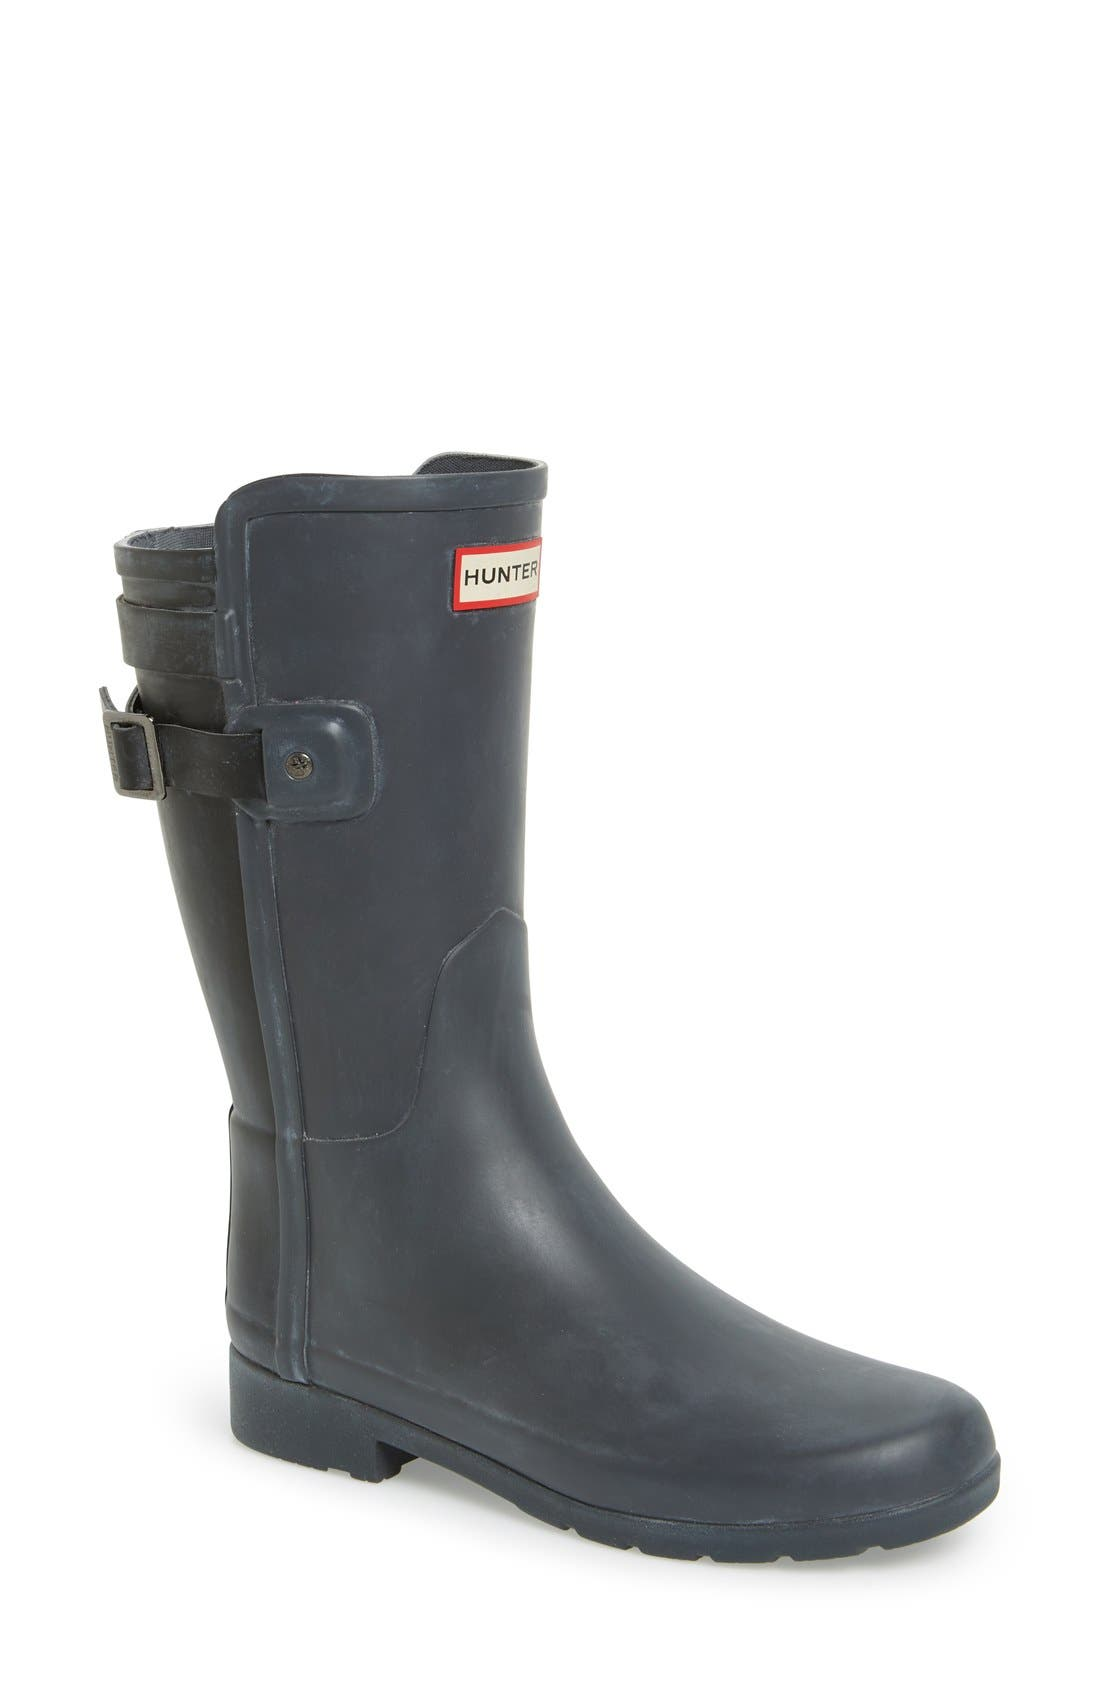 Alternate Image 1 Selected - Hunter 'Original Refined' Short Rain Boot (Women)